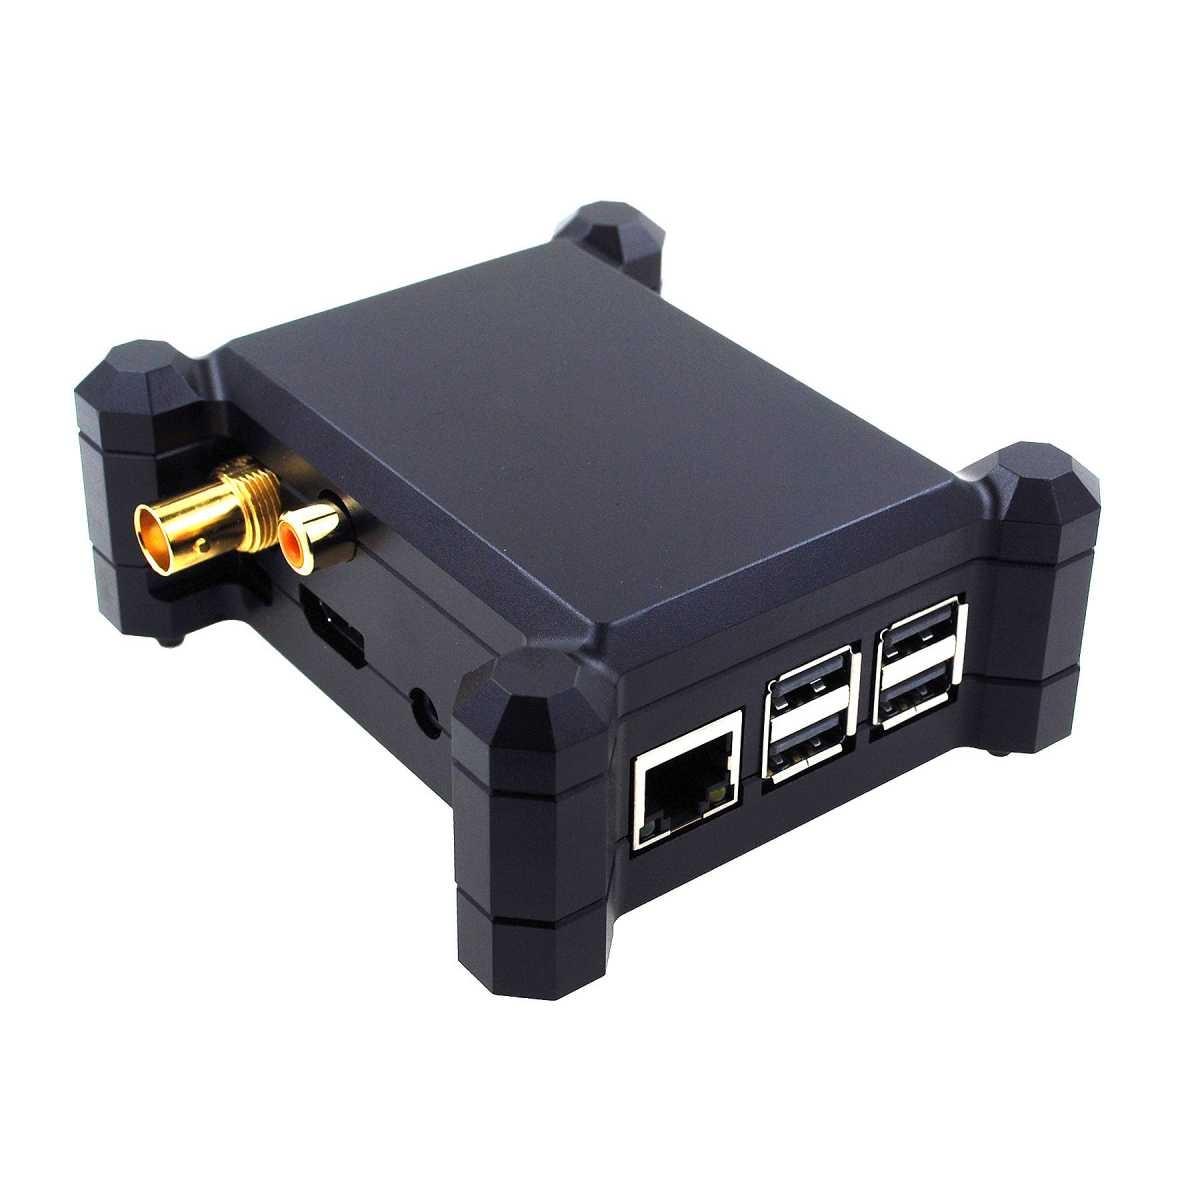 ALLO DIGIONE PLAYER Network audio Player Raspberry 3B+ Digital interface DigiOne Pre-installed Volumio Aluminum Casing